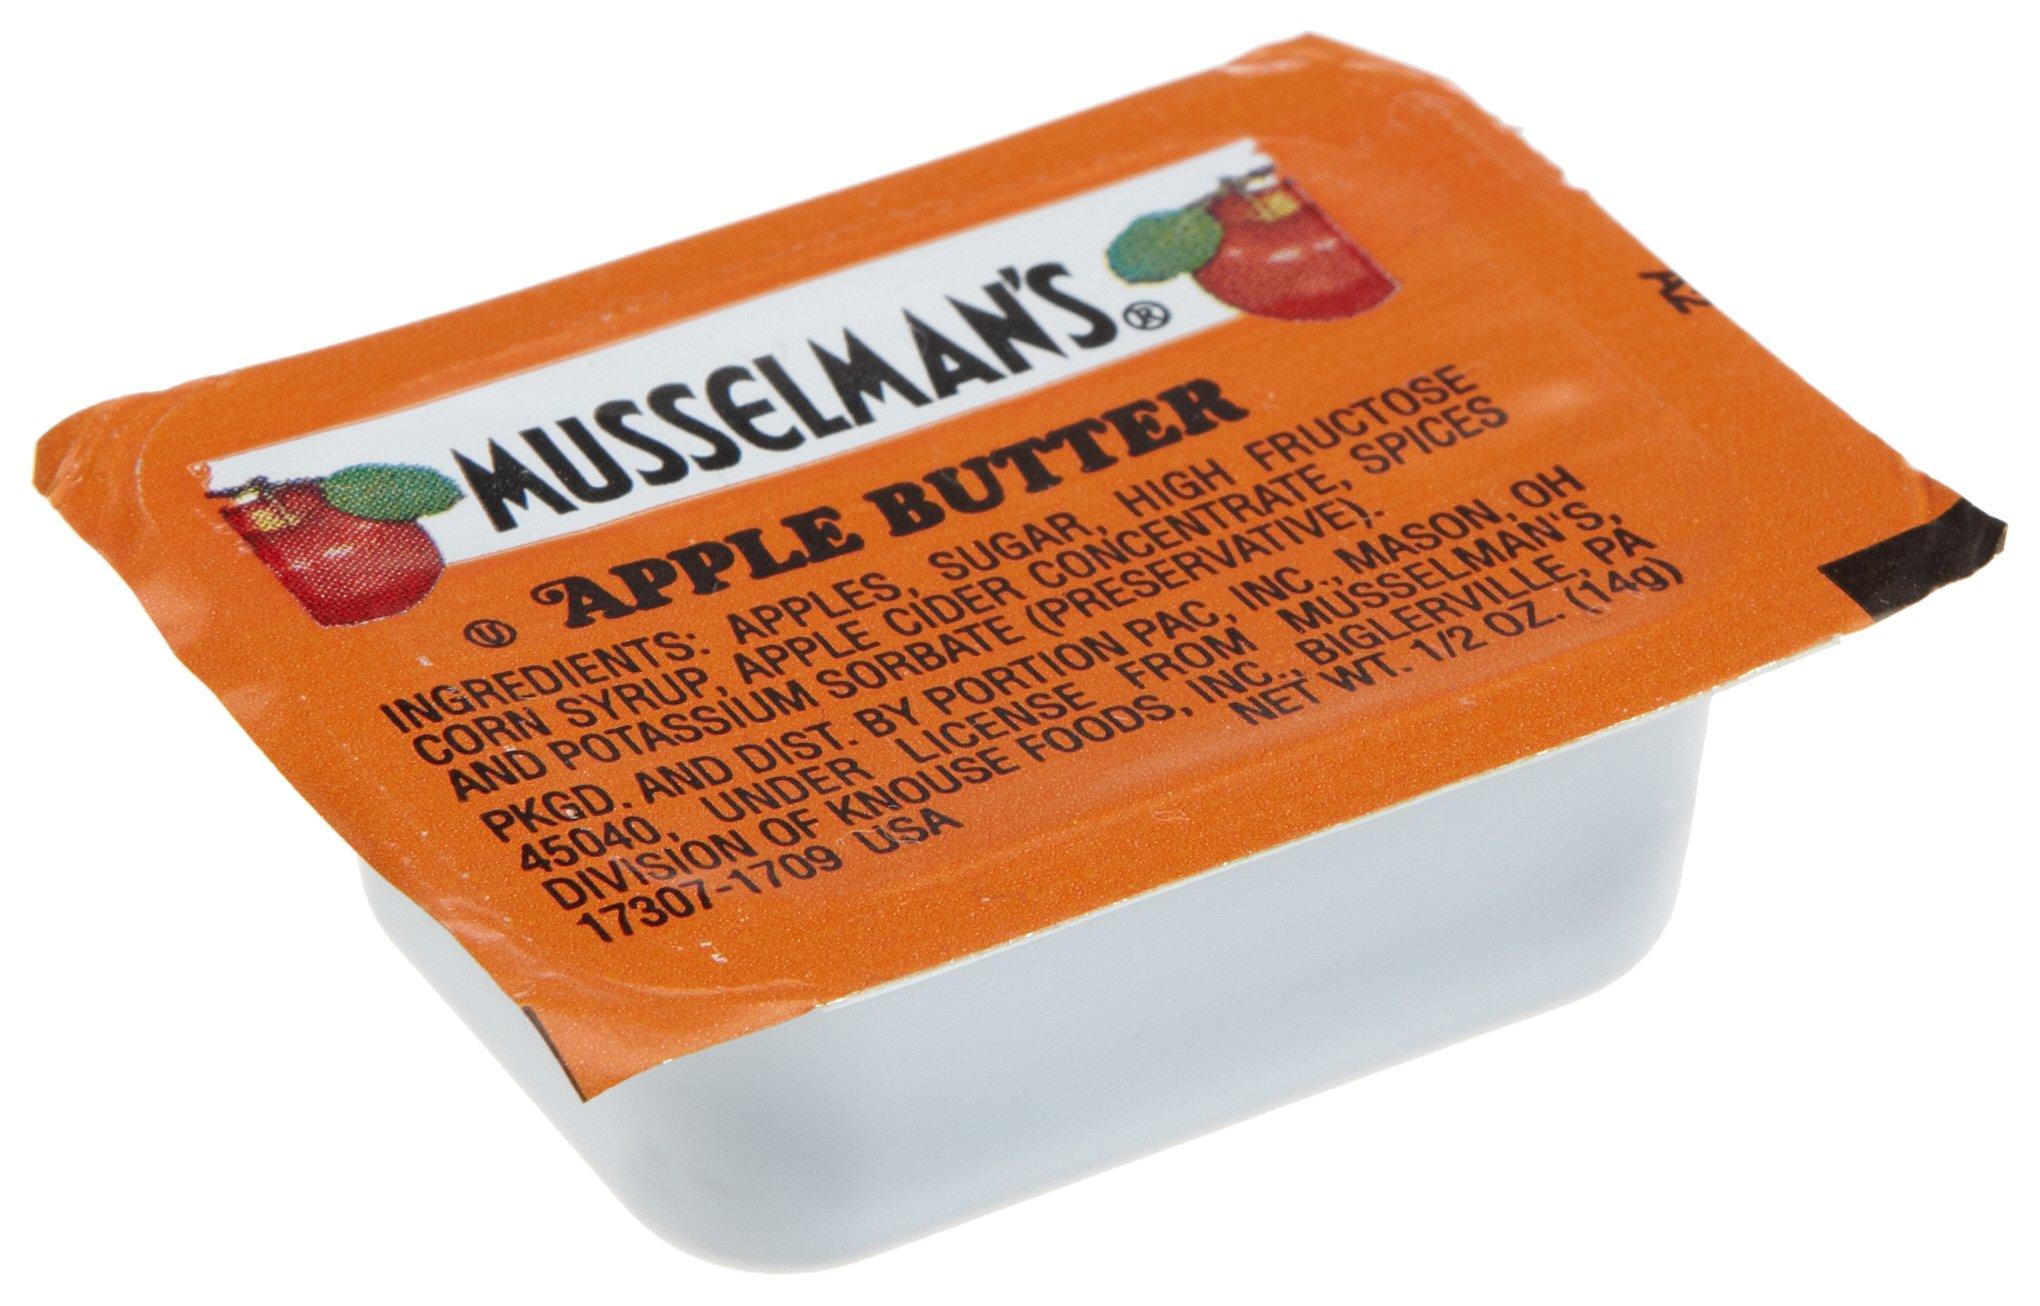 Musselmans Apple Butter, 0.5-Ounce Single Serve Cups (Pack of 200)